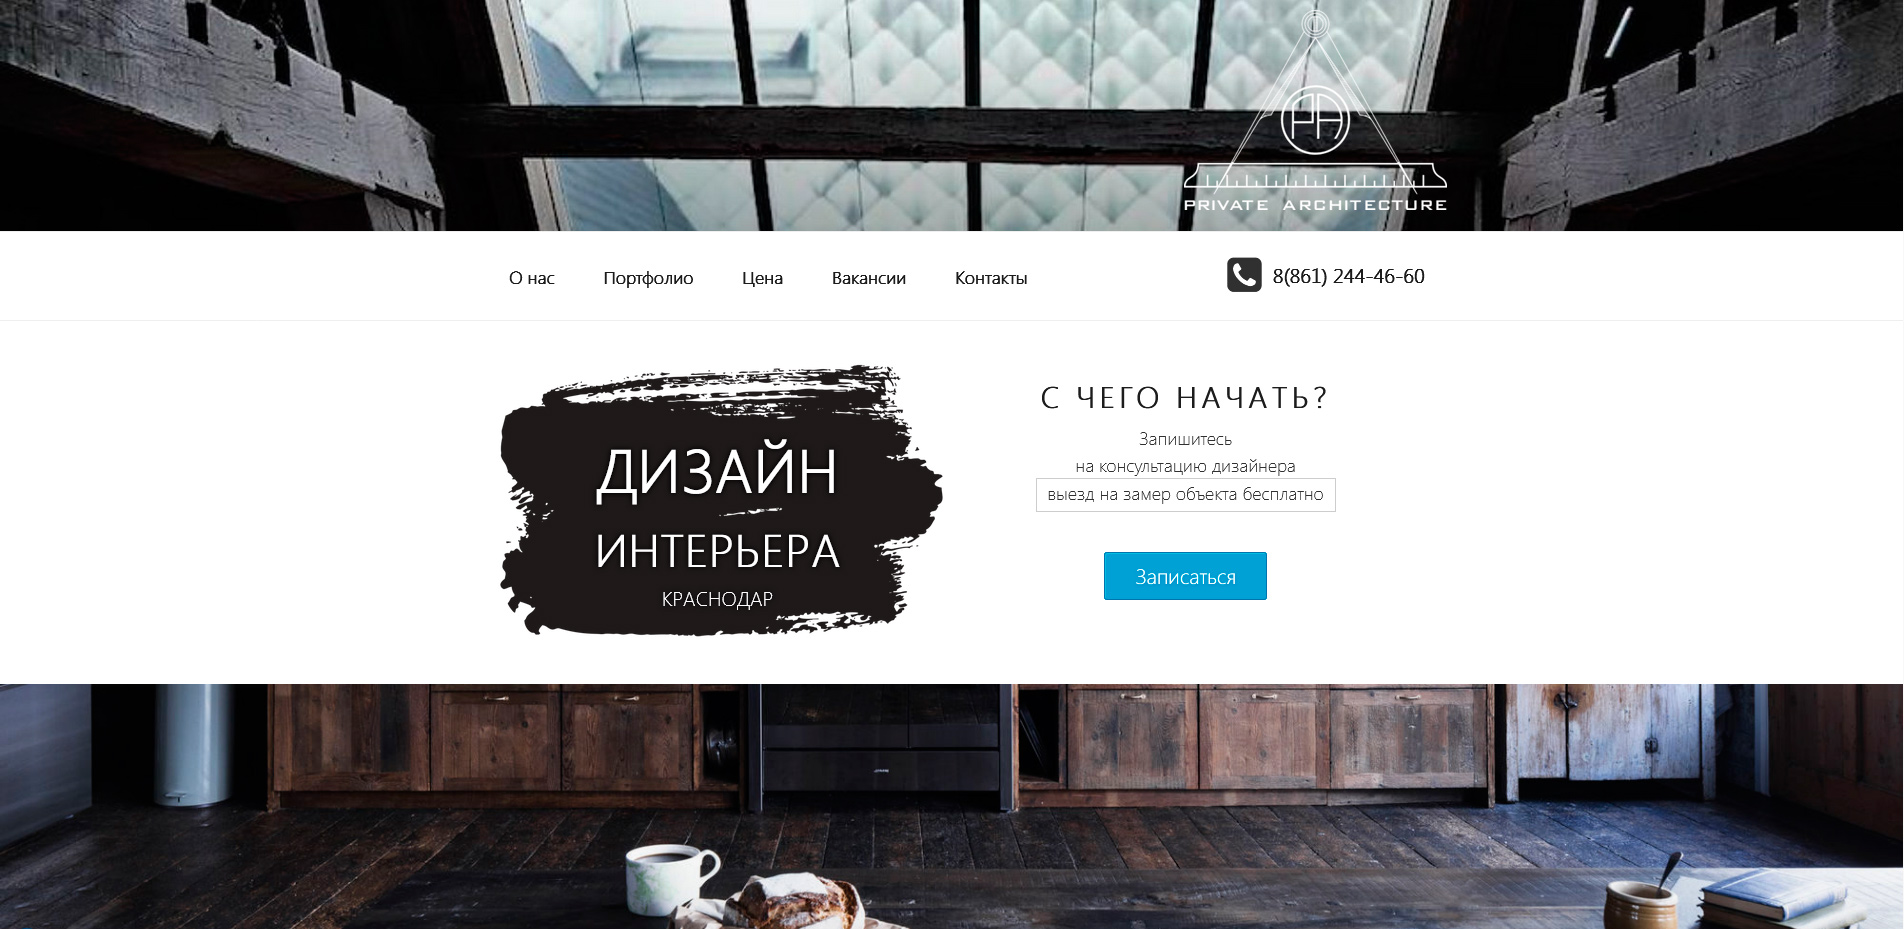 Сайт дизайна интерьера - Privatarchi.com